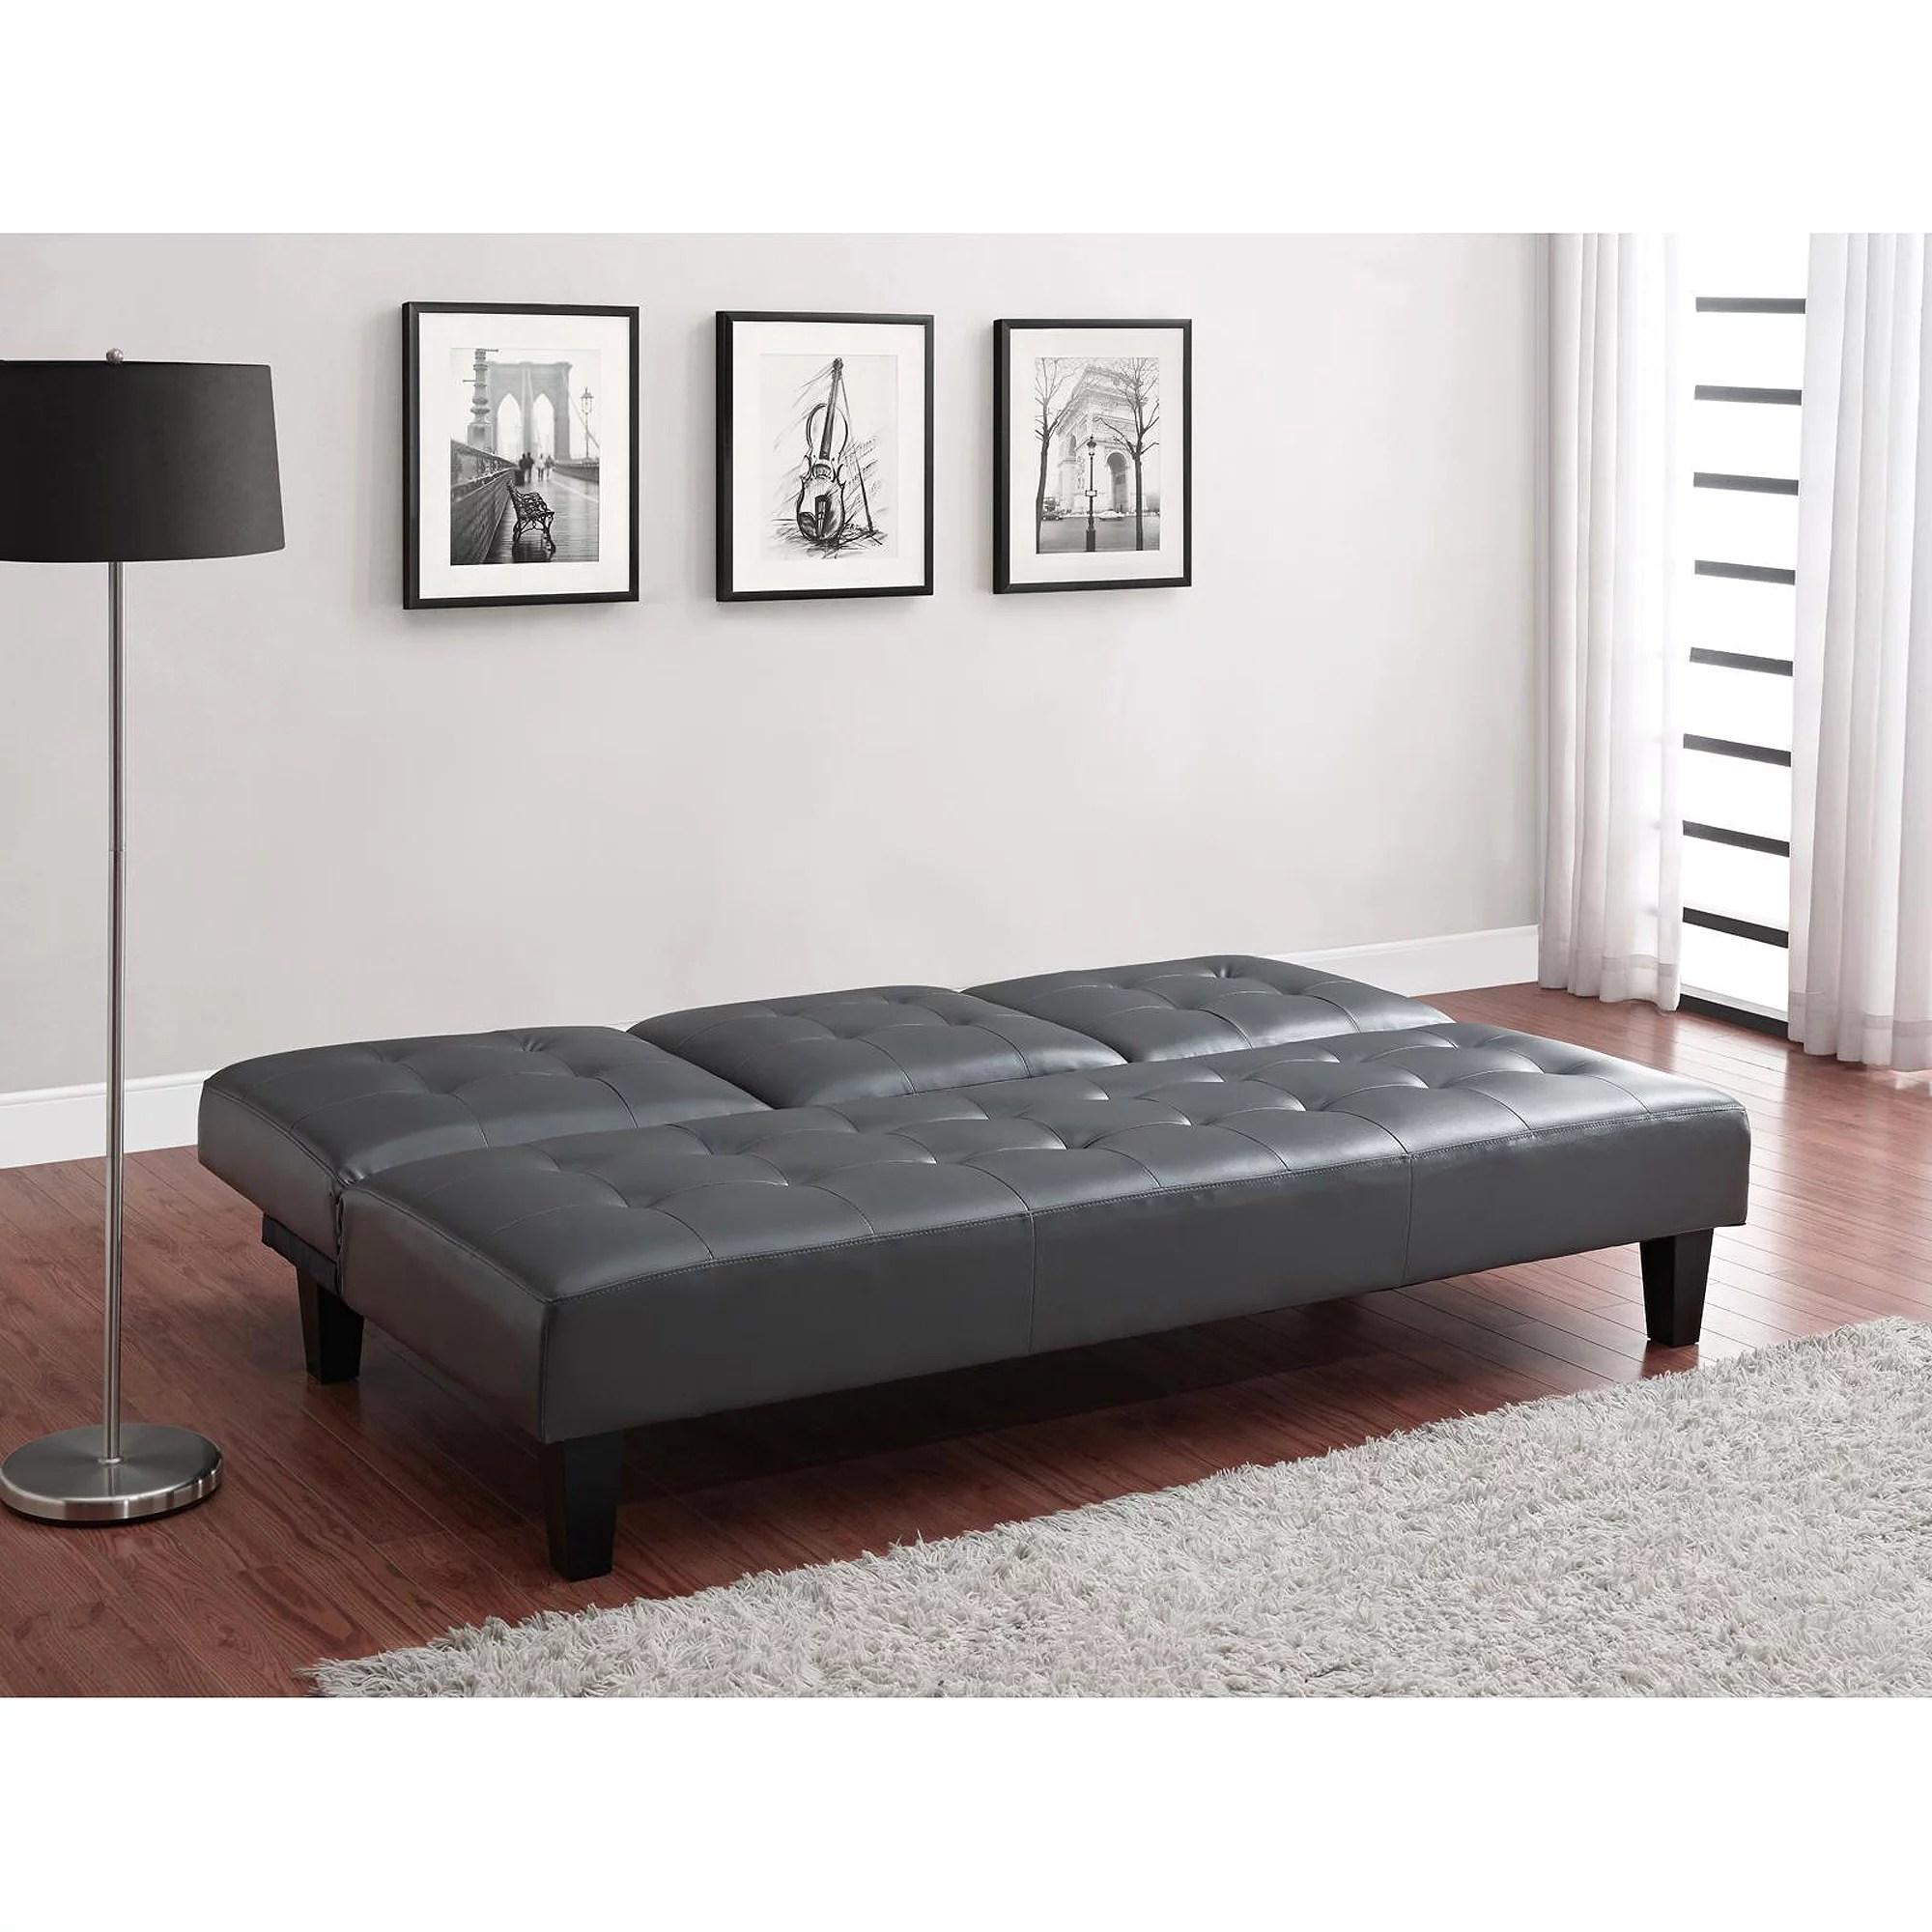 cup holder sofa bed simon li leather julia convertible futon